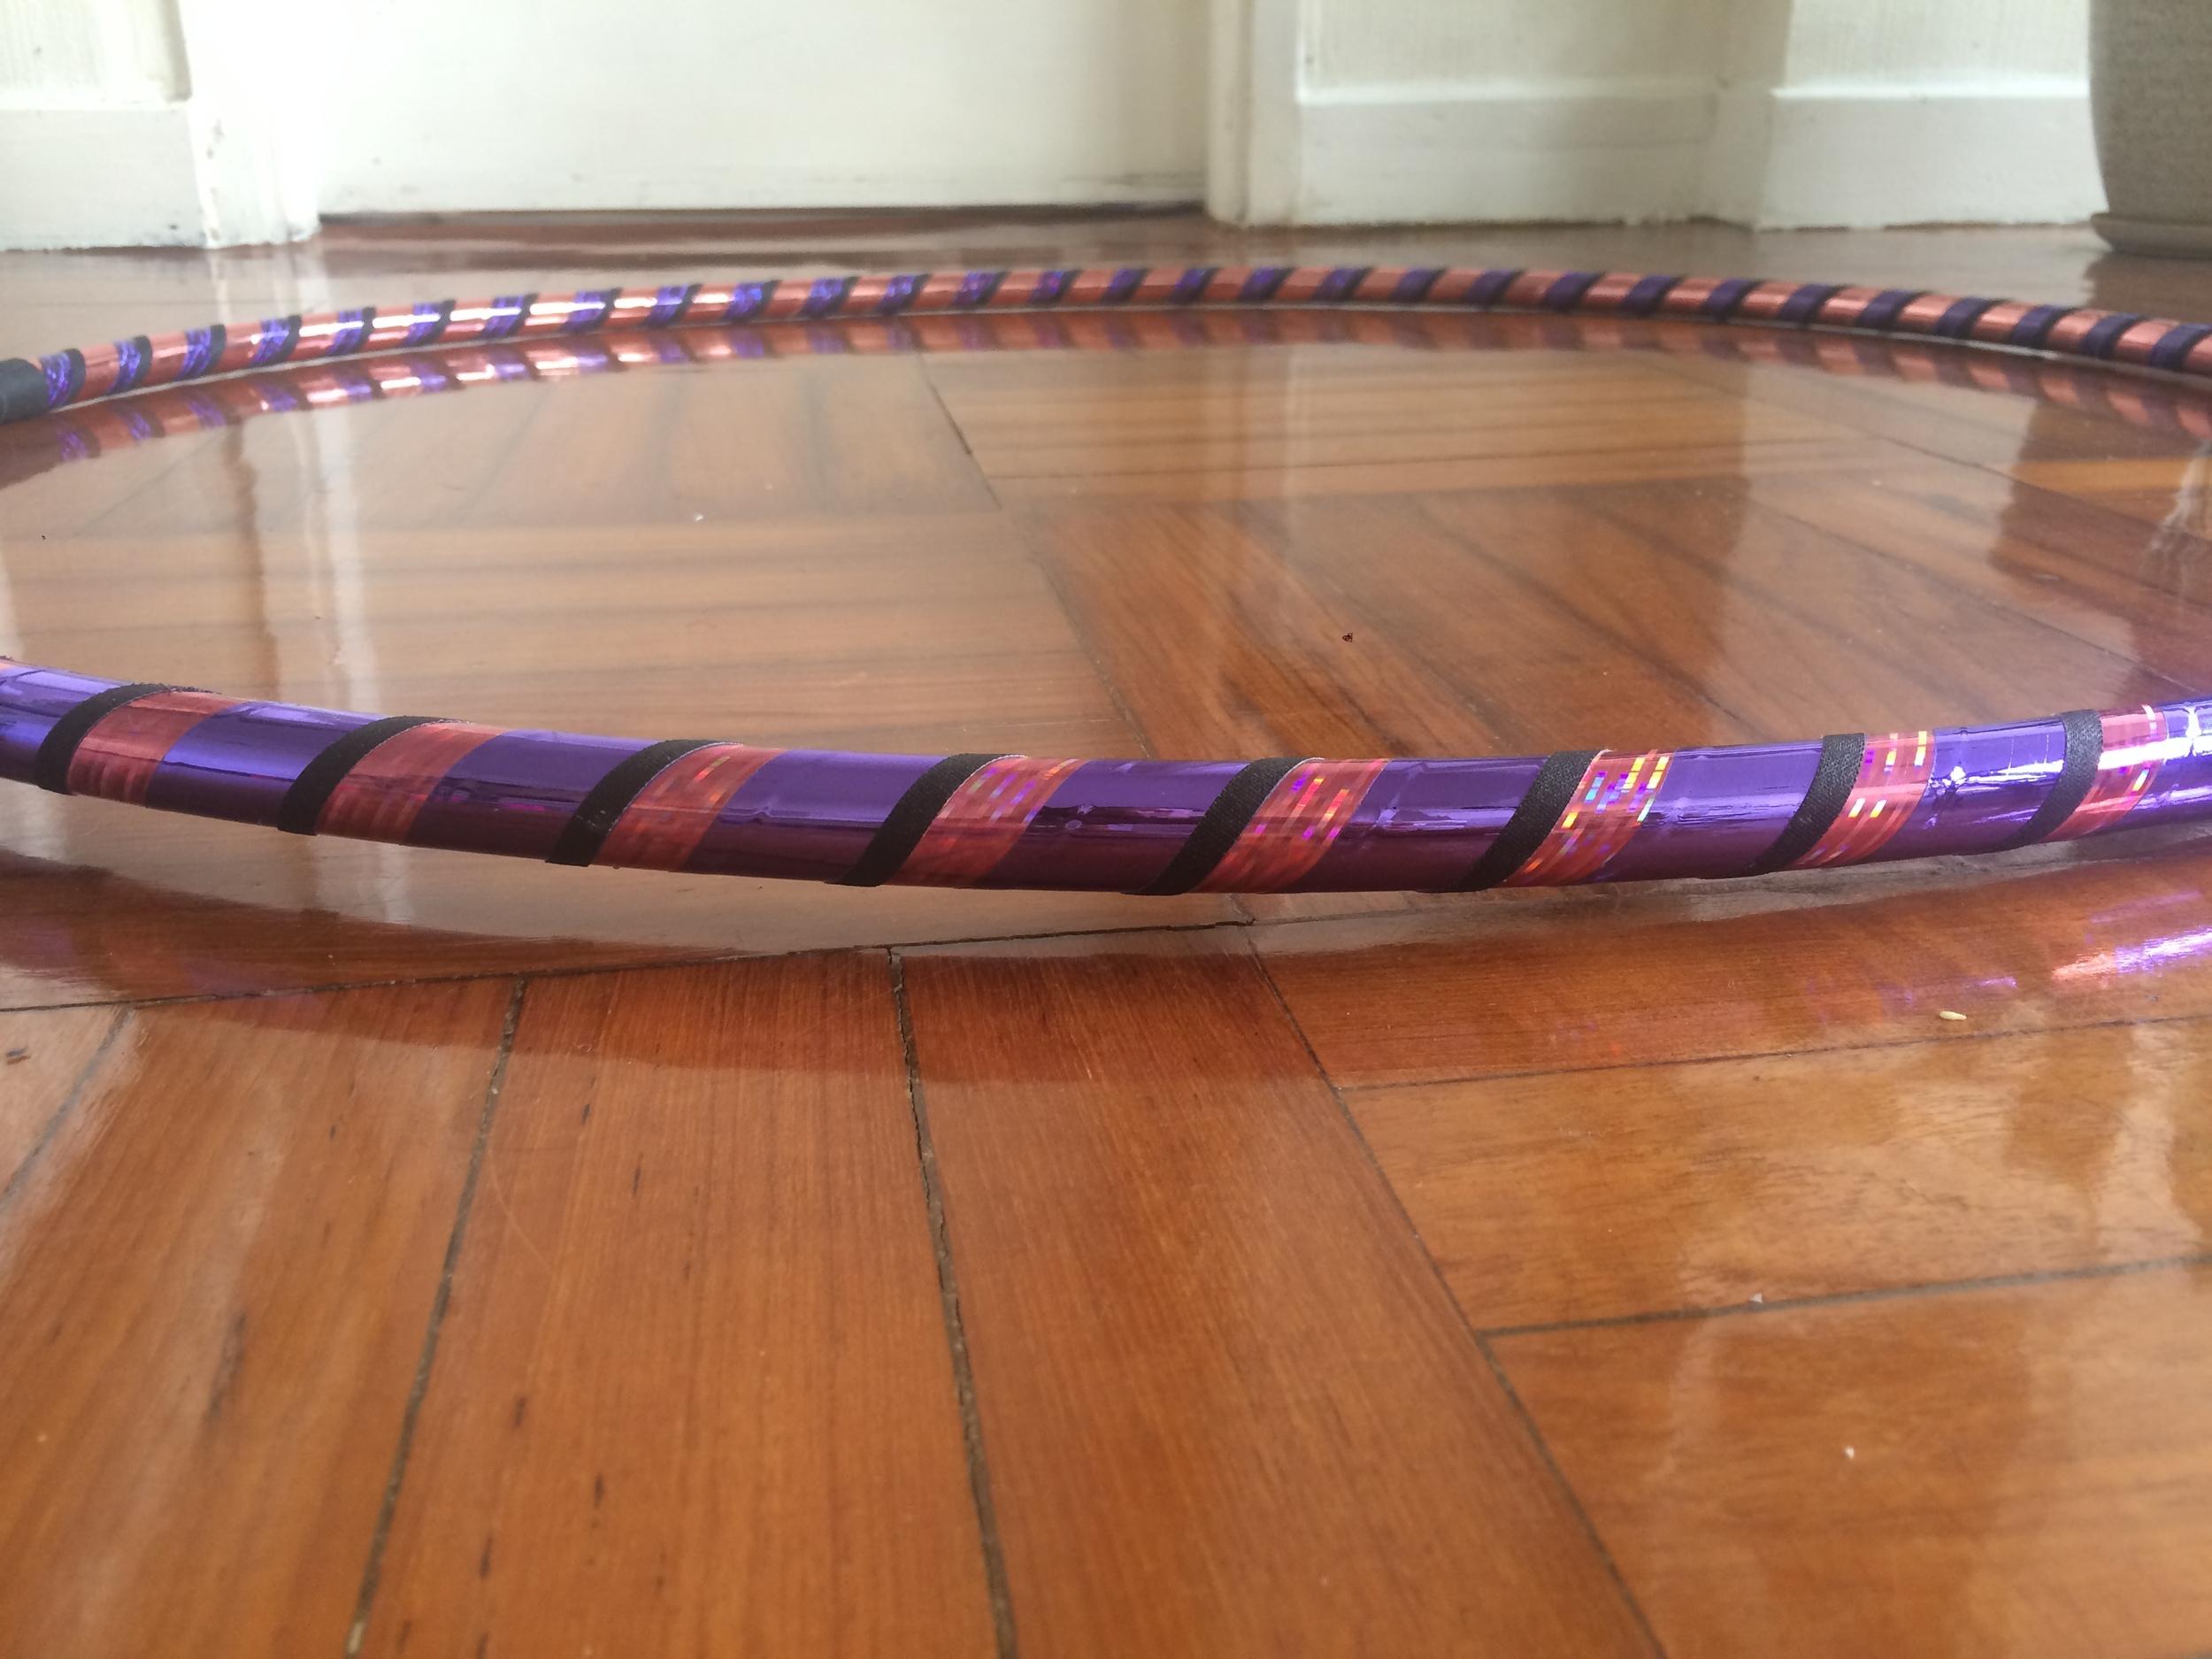 hula hoop for sale hong kong 香港呼啦圈出售